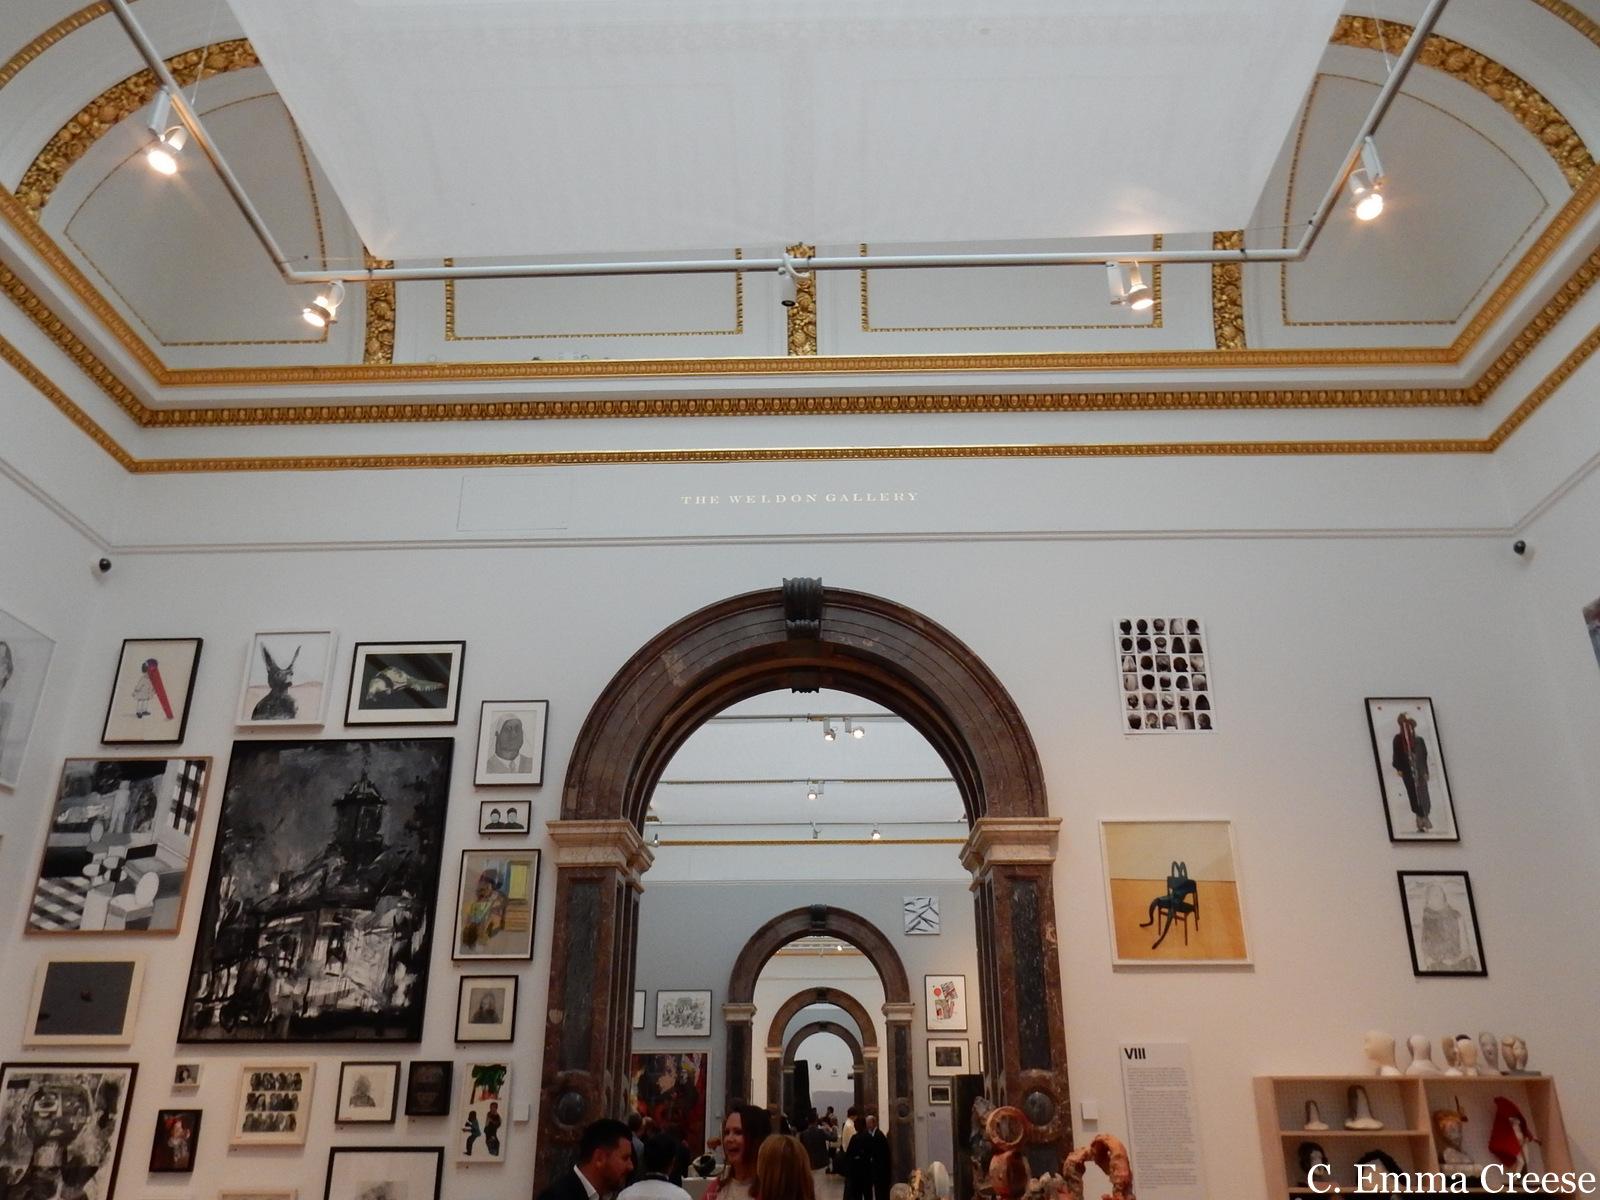 Modern art at the Royal Academy Adventures of a London Kiwi